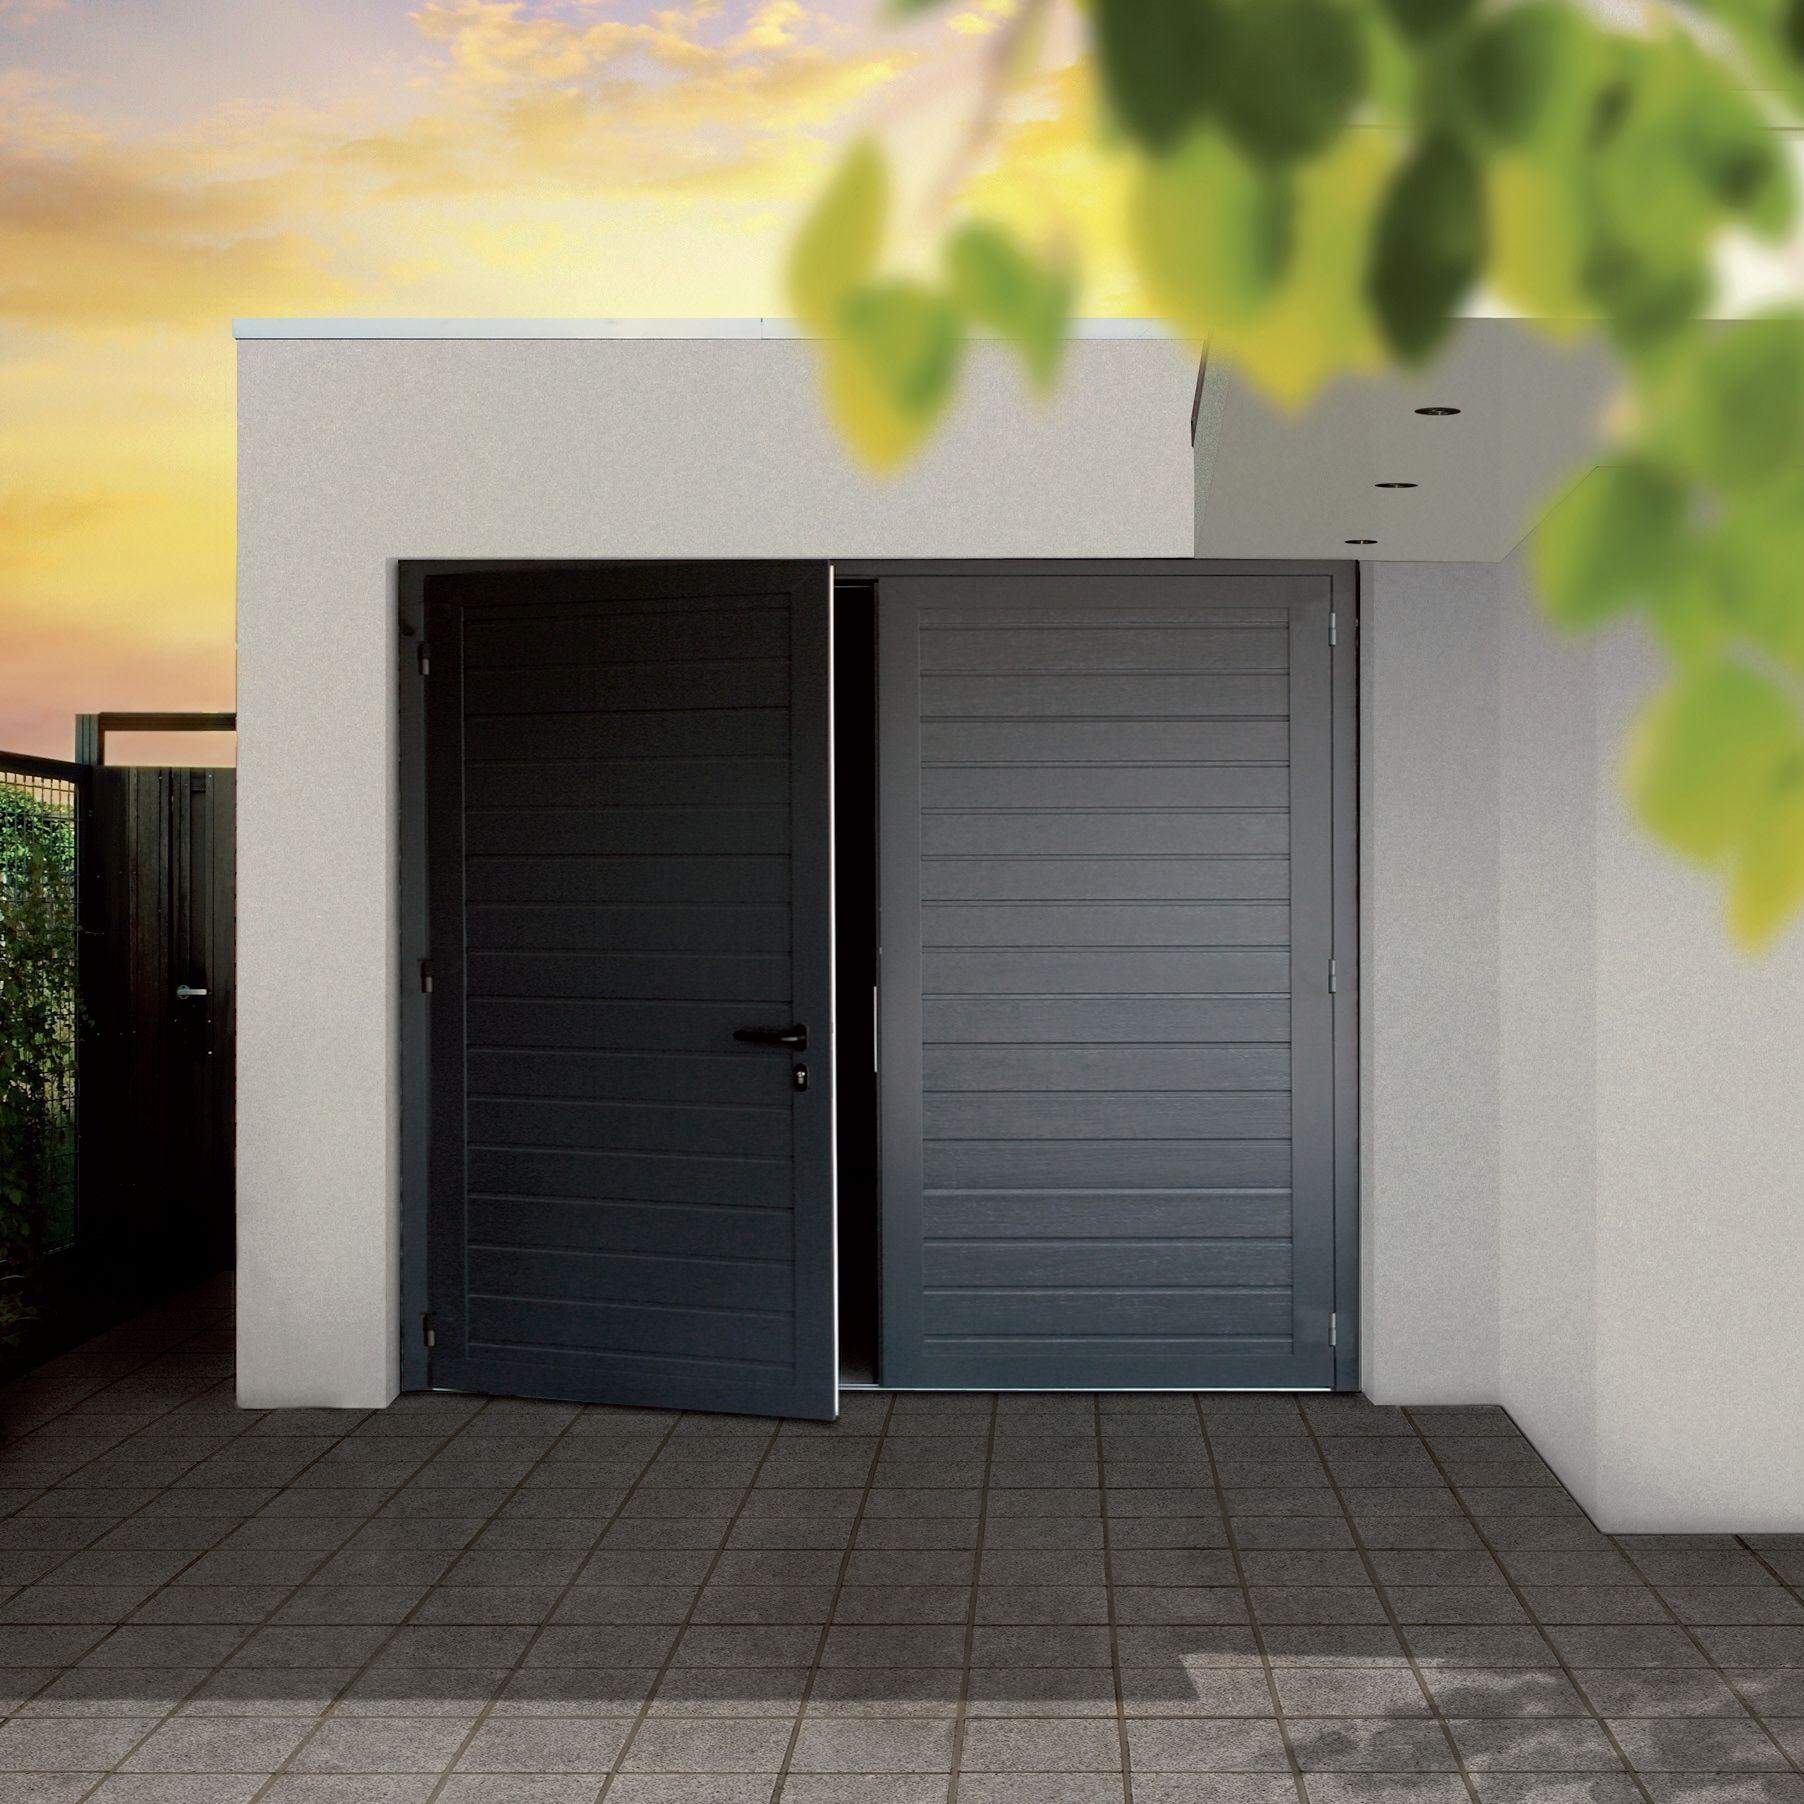 garagen sektionaltore ais. Black Bedroom Furniture Sets. Home Design Ideas